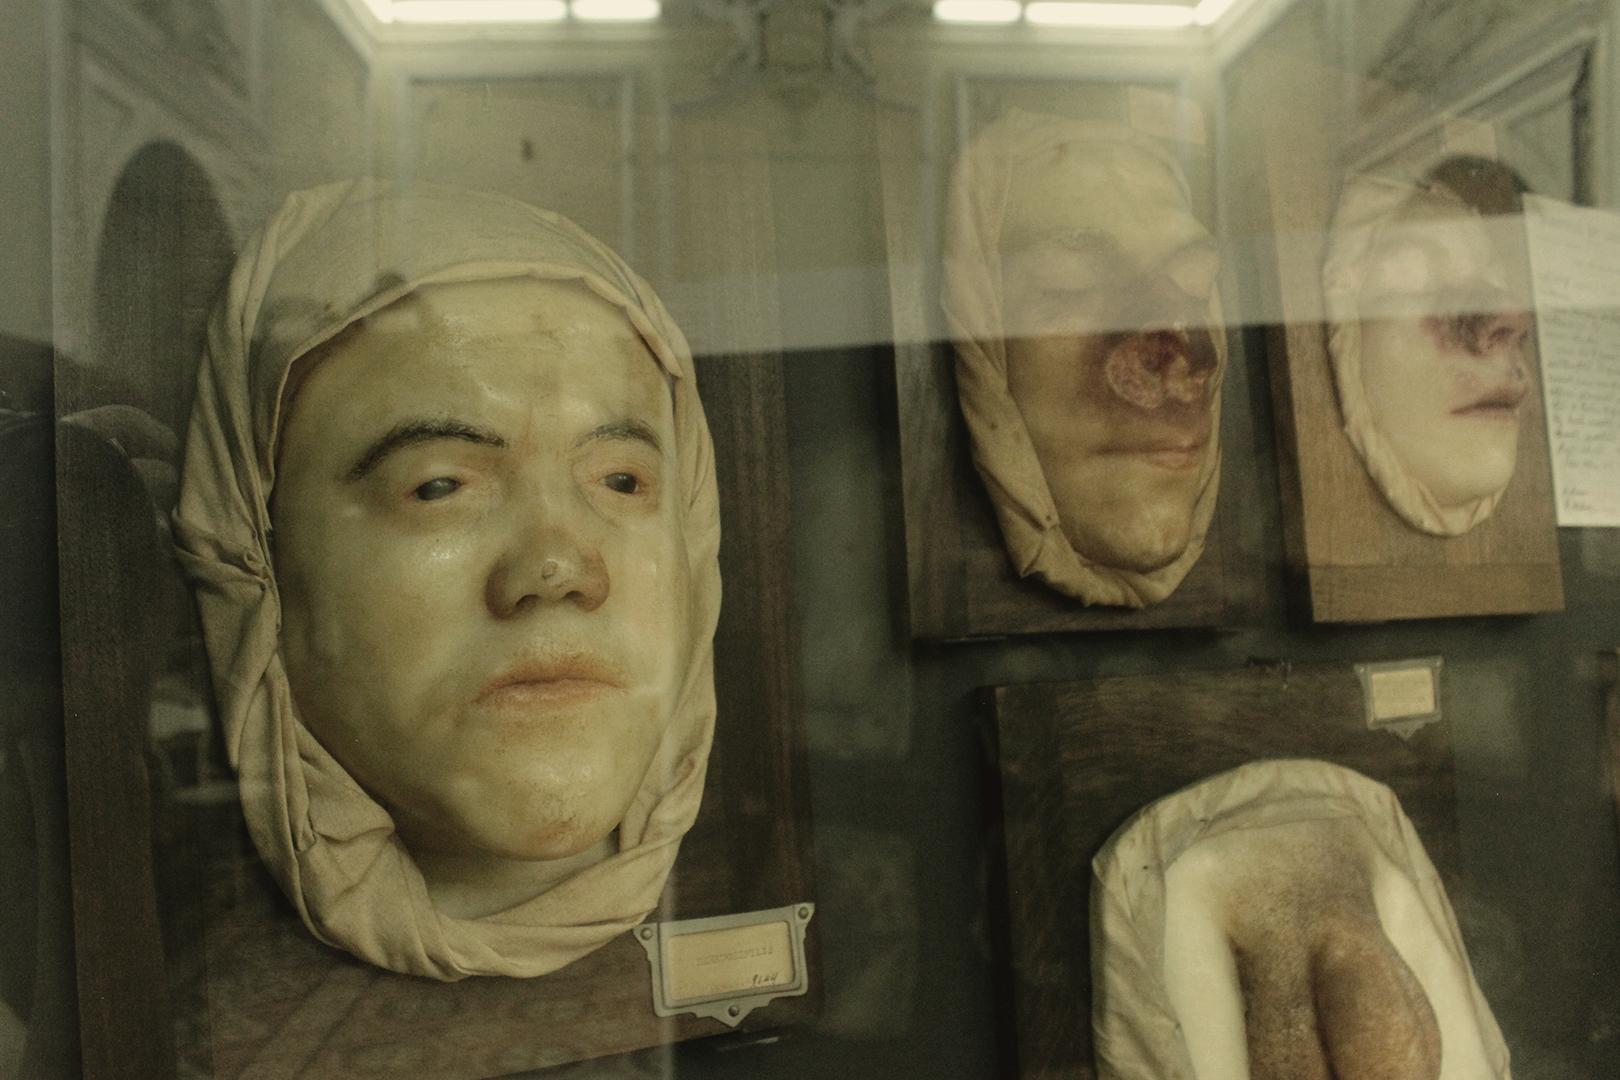 Wax models of syphilis lesions, Museum of Portuguese Dermatology (Museu da Dermatologia Portuguesa).